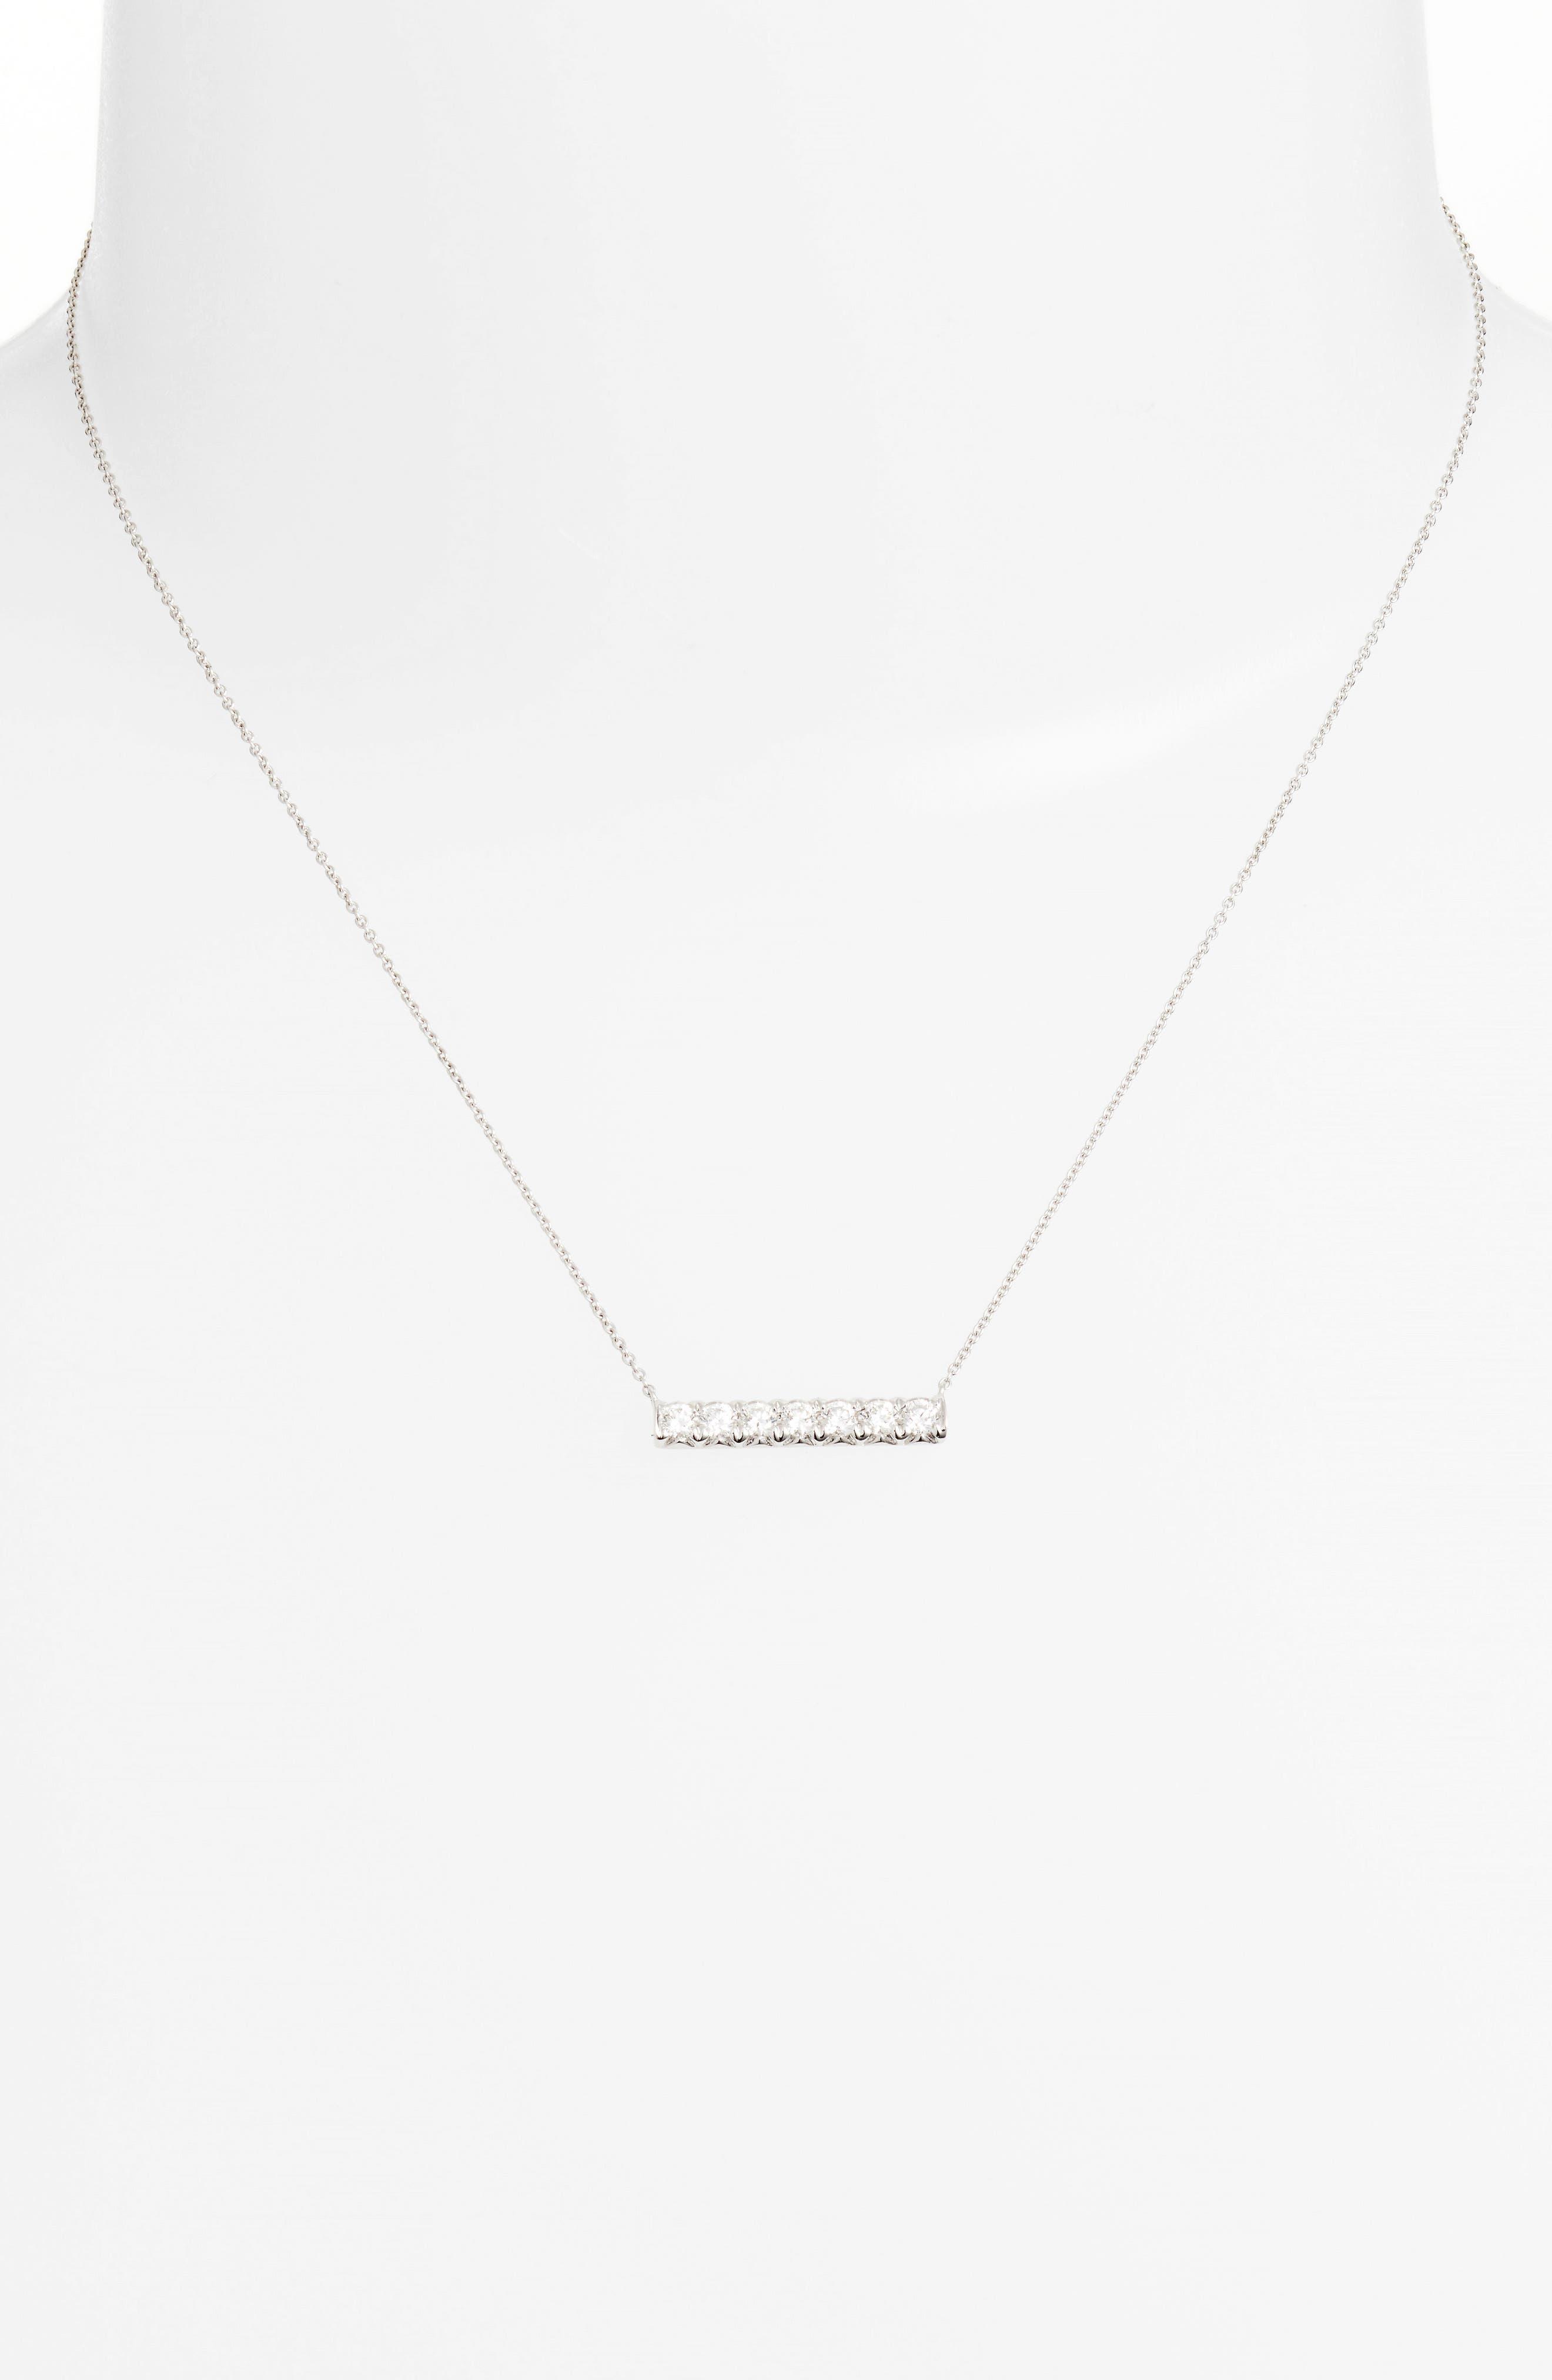 Kiera Diamond Pendant Necklace,                             Alternate thumbnail 2, color,                             White Gold